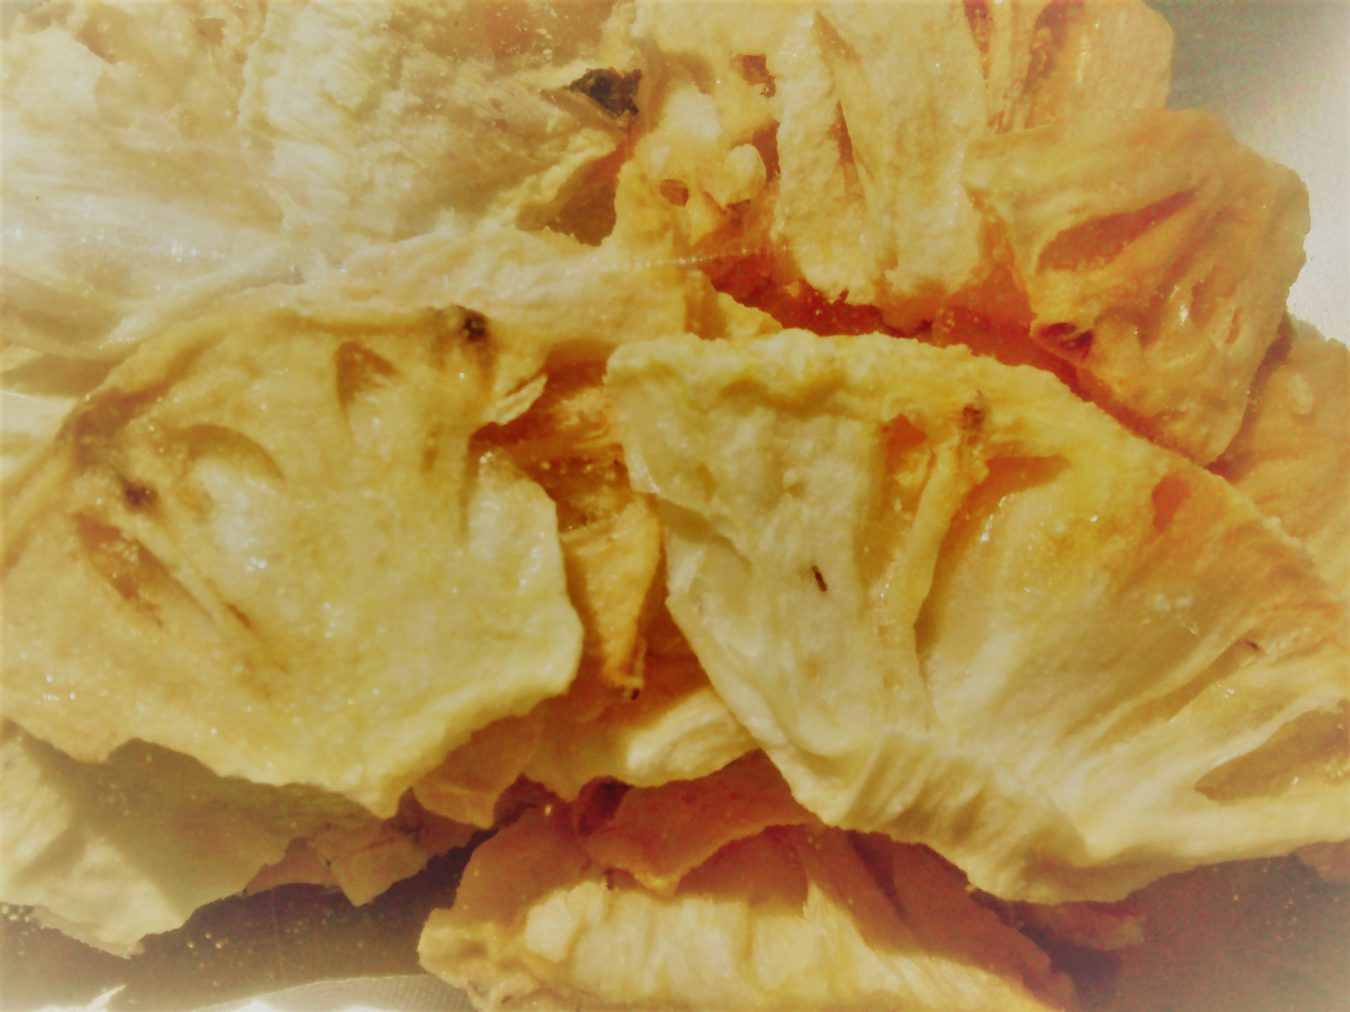 Ananas lyophilisé